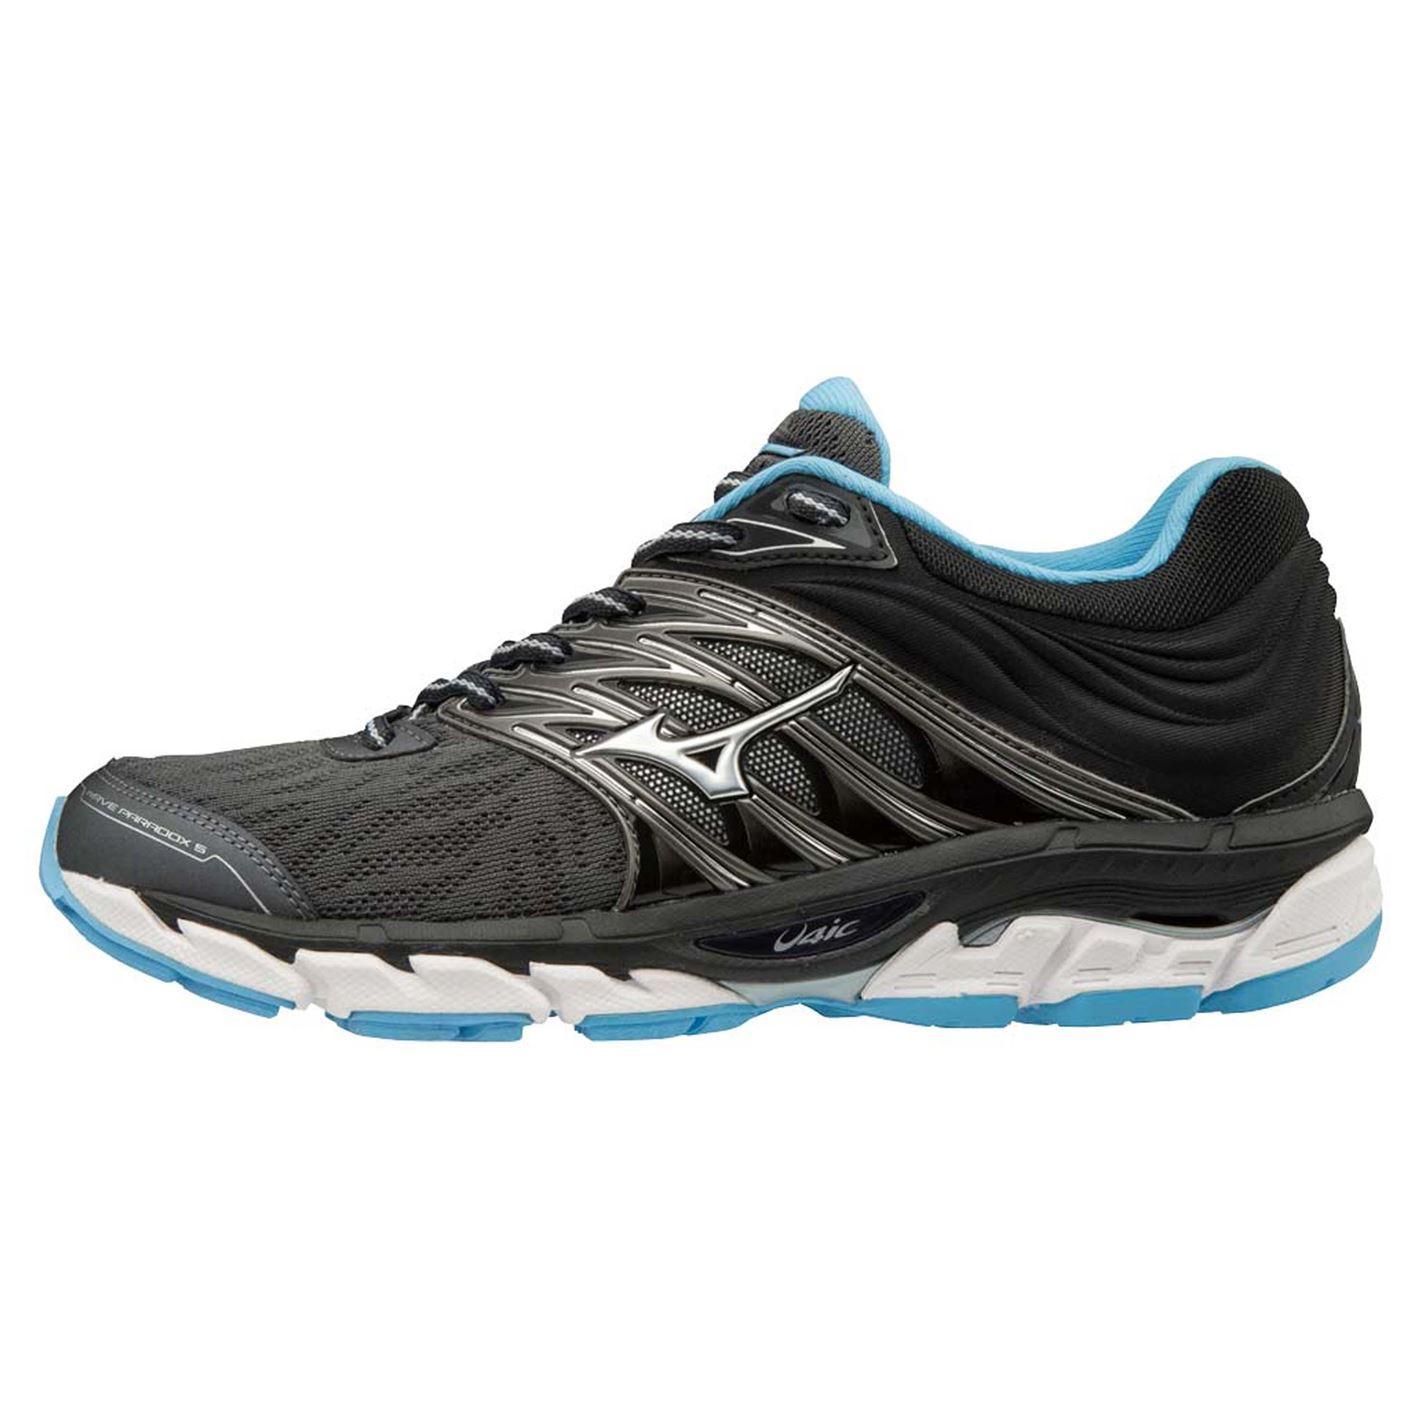 Mizuno Damenschuhe Wave Paradox 5 5 5 Running Schuhes Road Mesh Upper ea7cc0